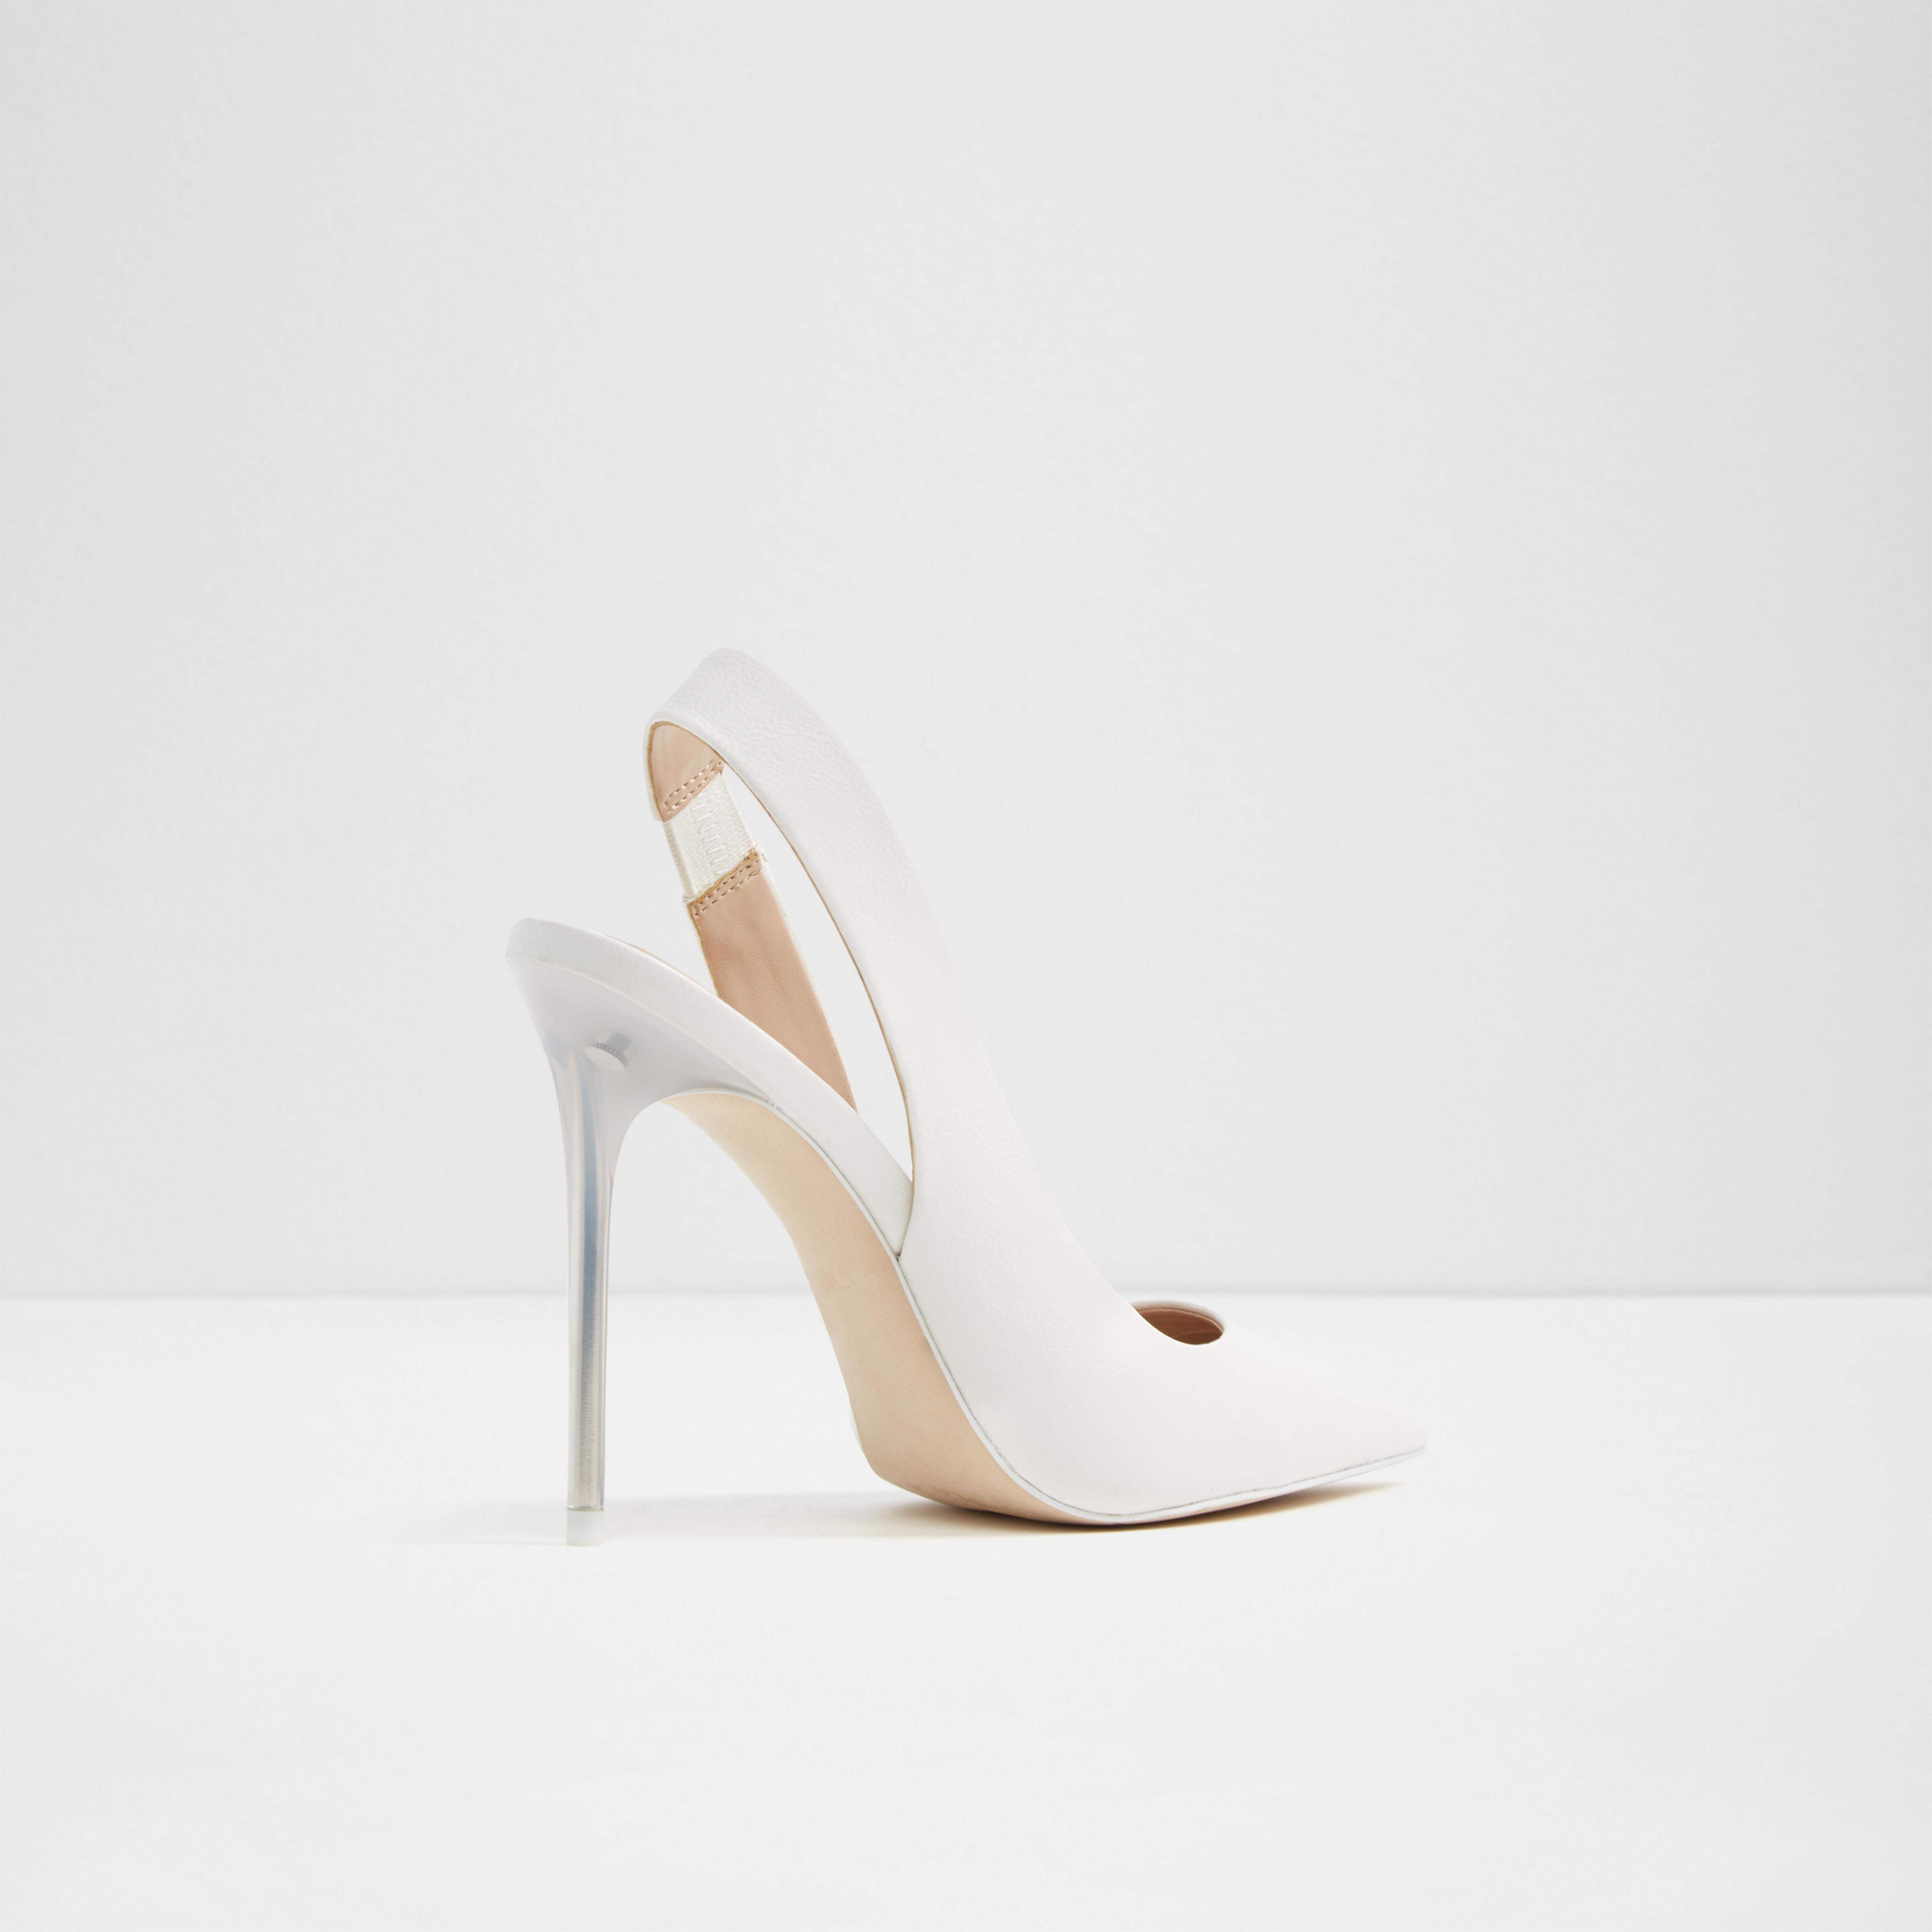 92adb625336 Lyst - ALDO Niky in White